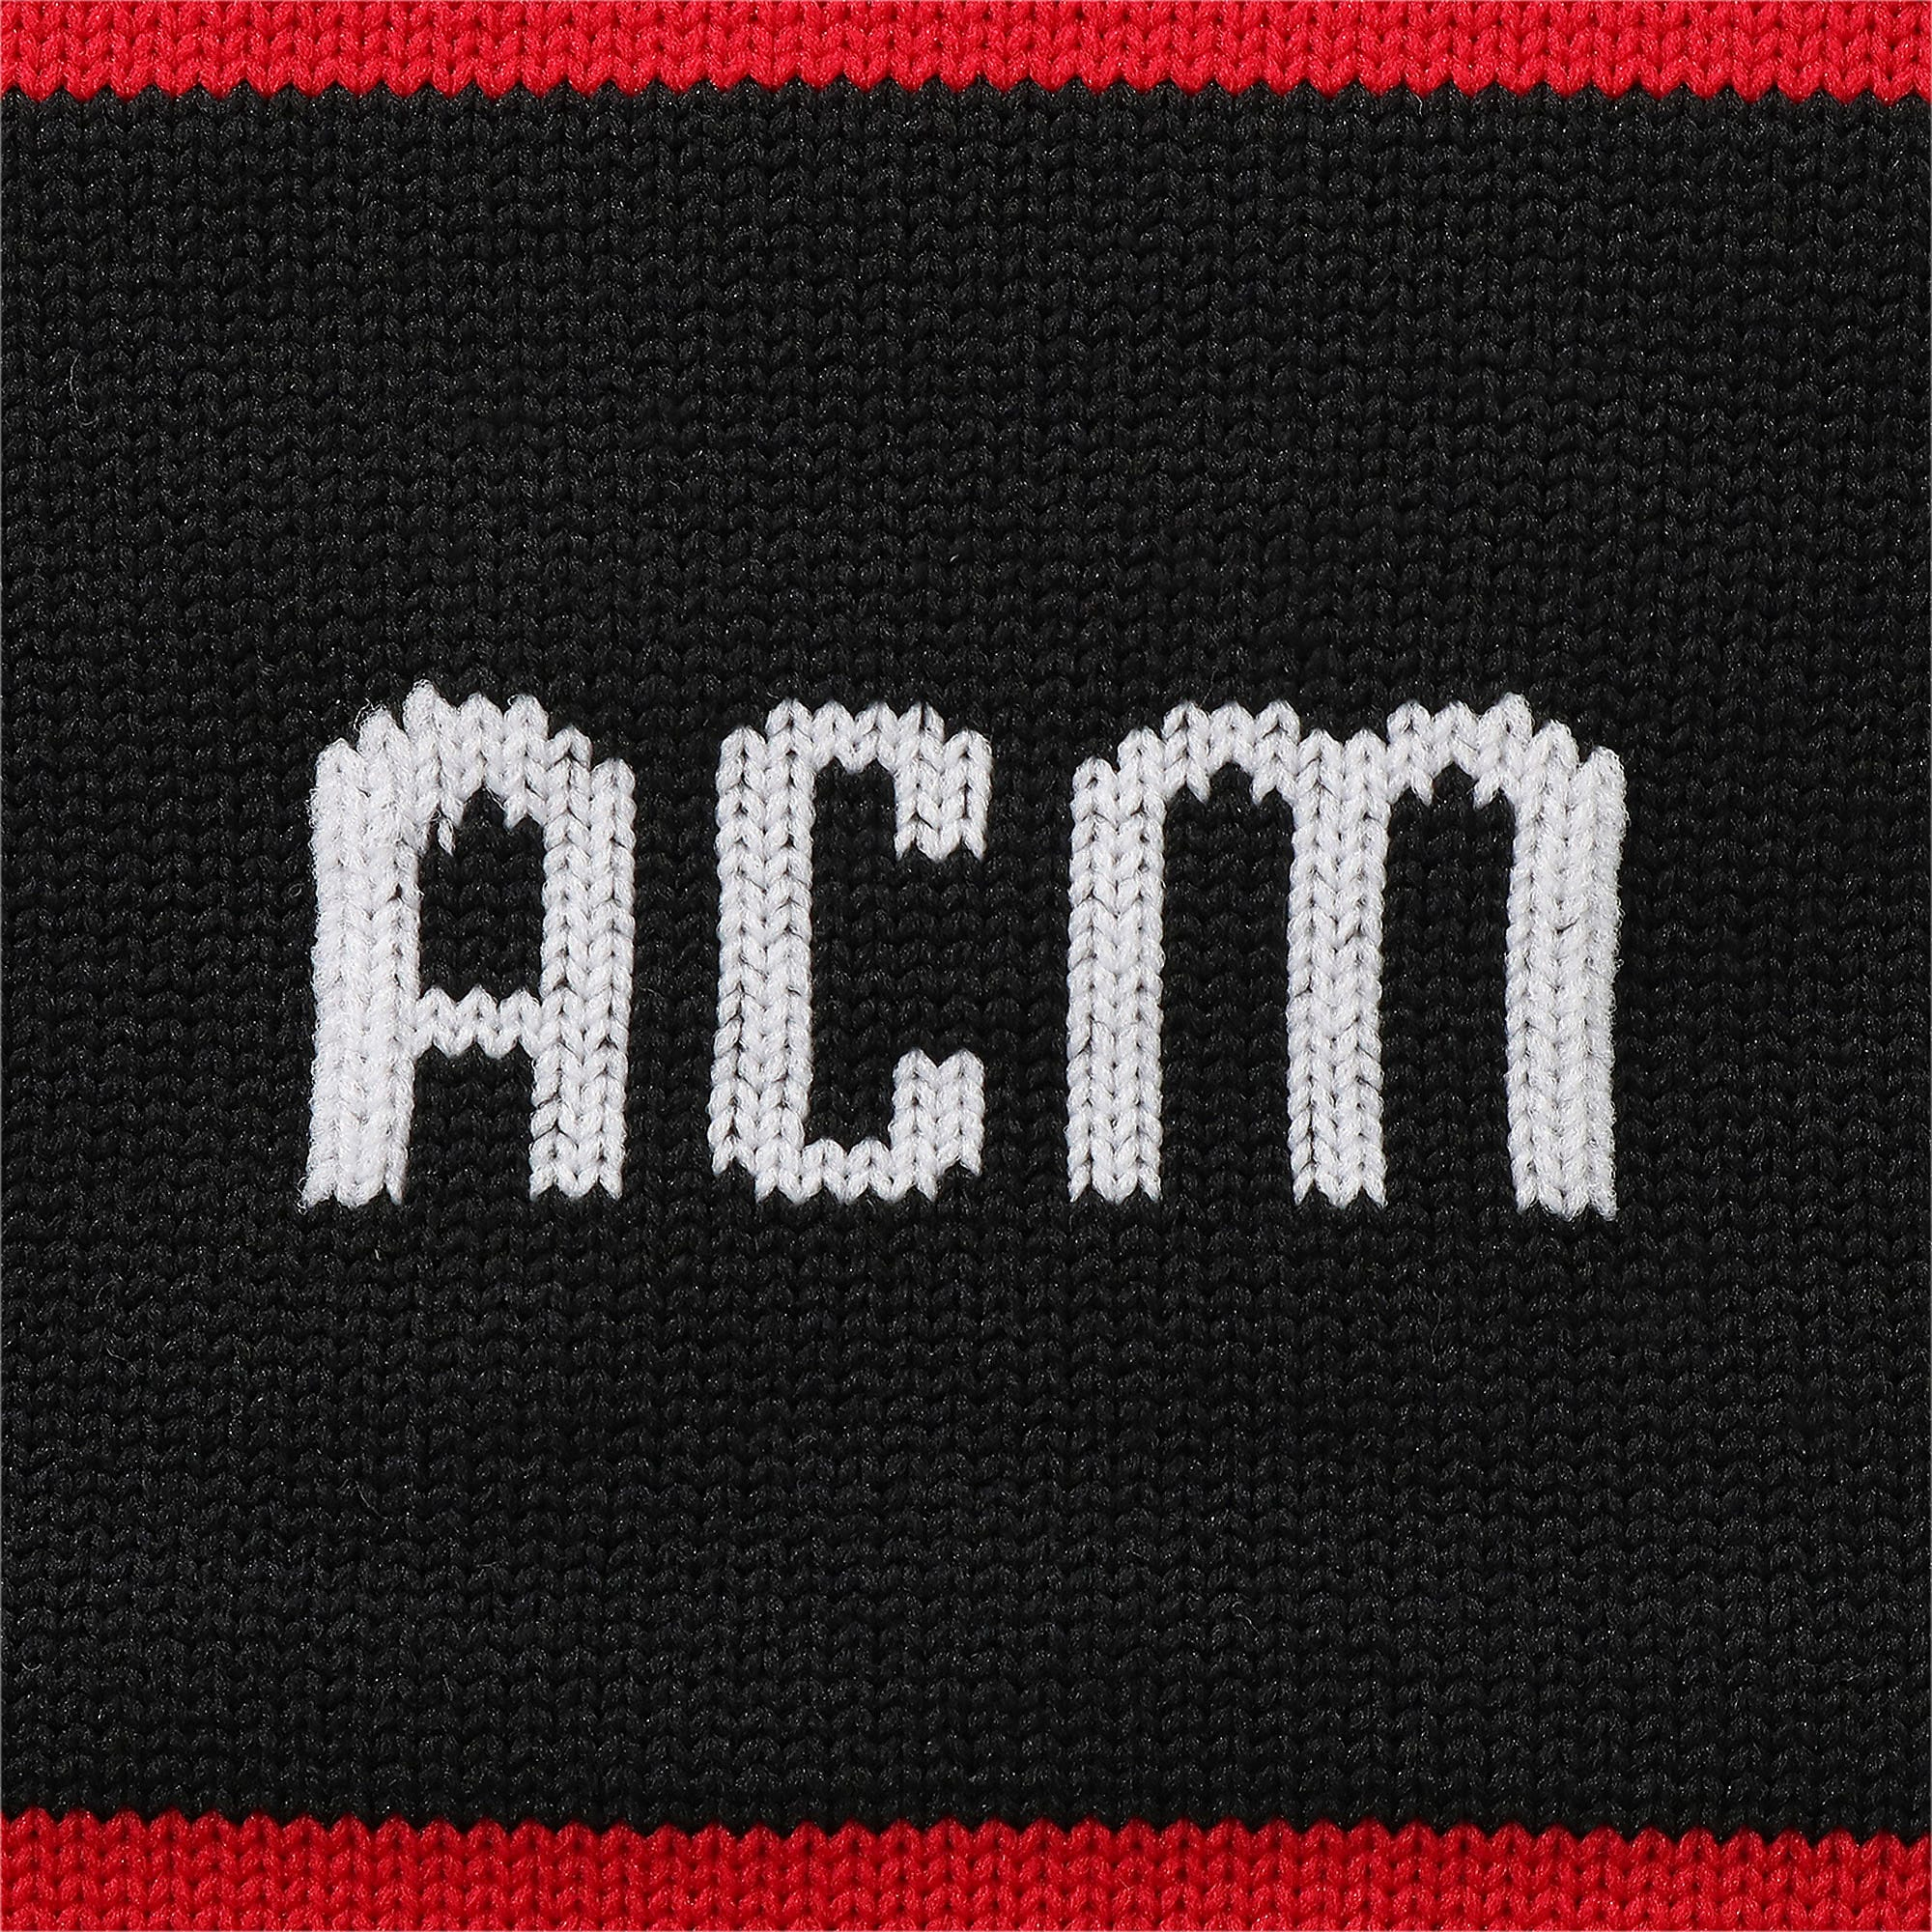 Thumbnail 7 of ACミラン ACM バンド ストッキング, Puma Black-Tango Red, medium-JPN